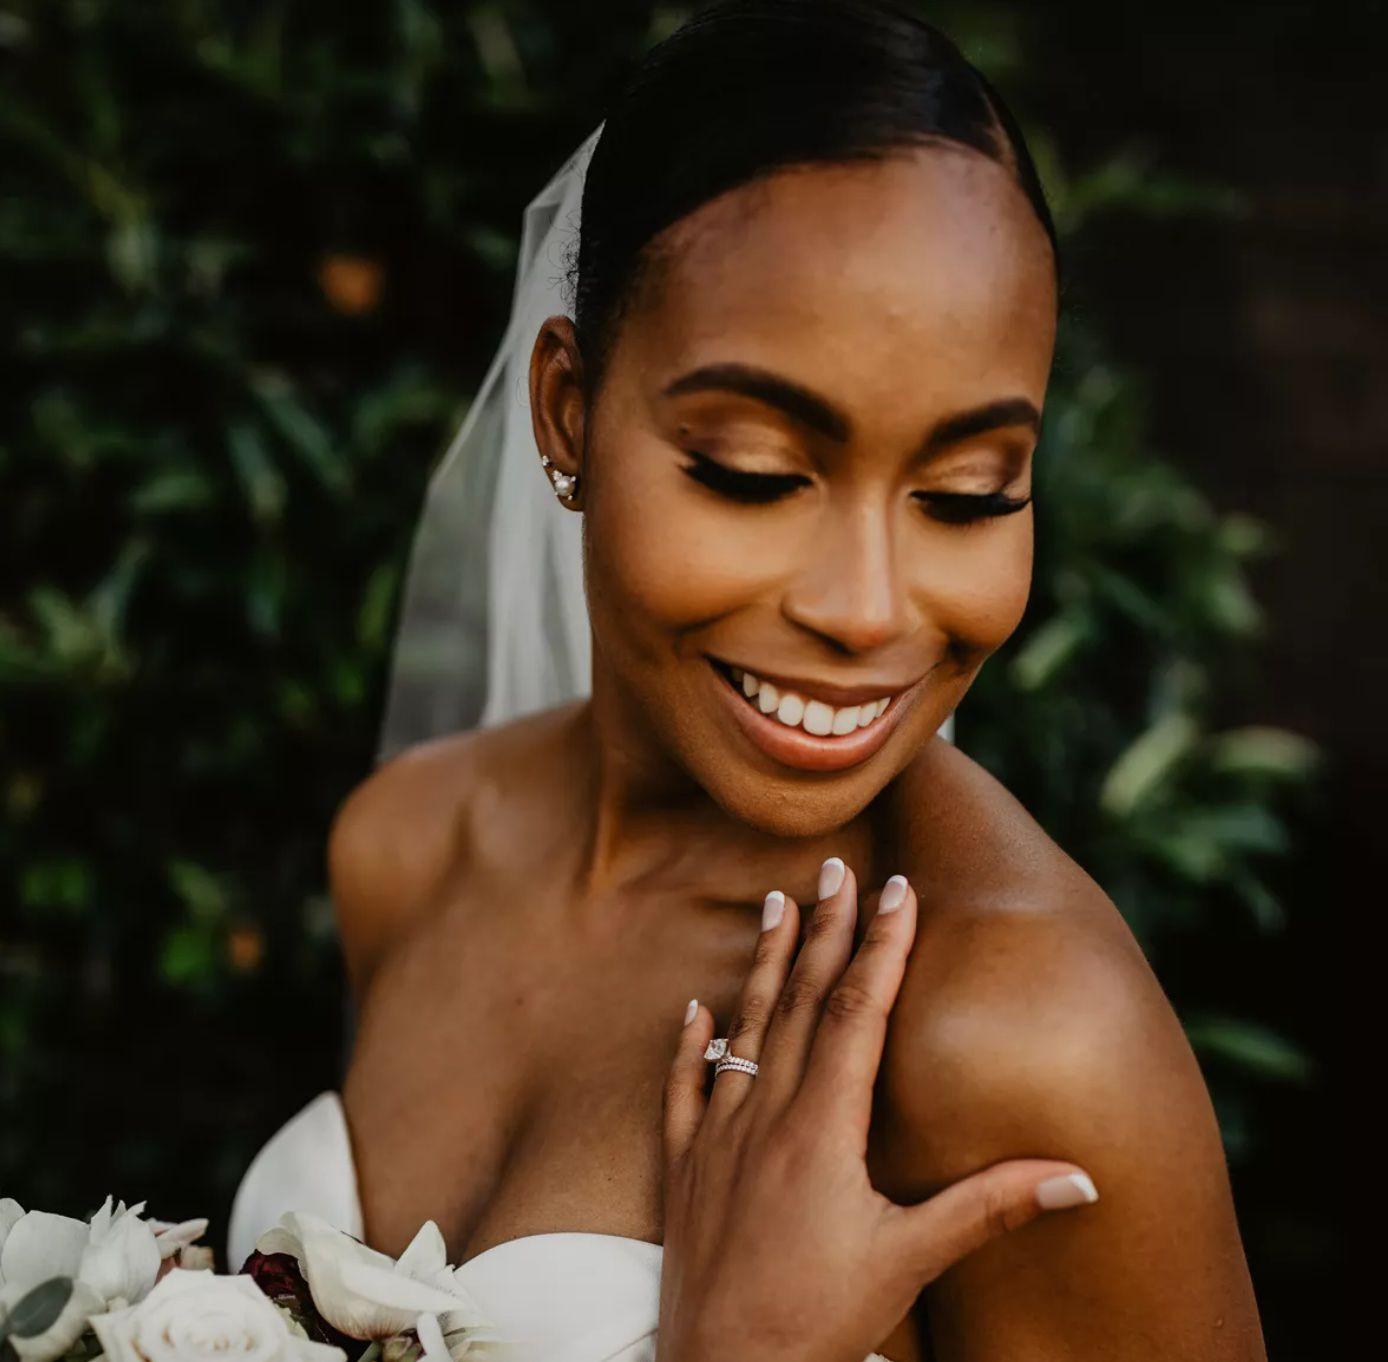 Bride smiling on wedding day